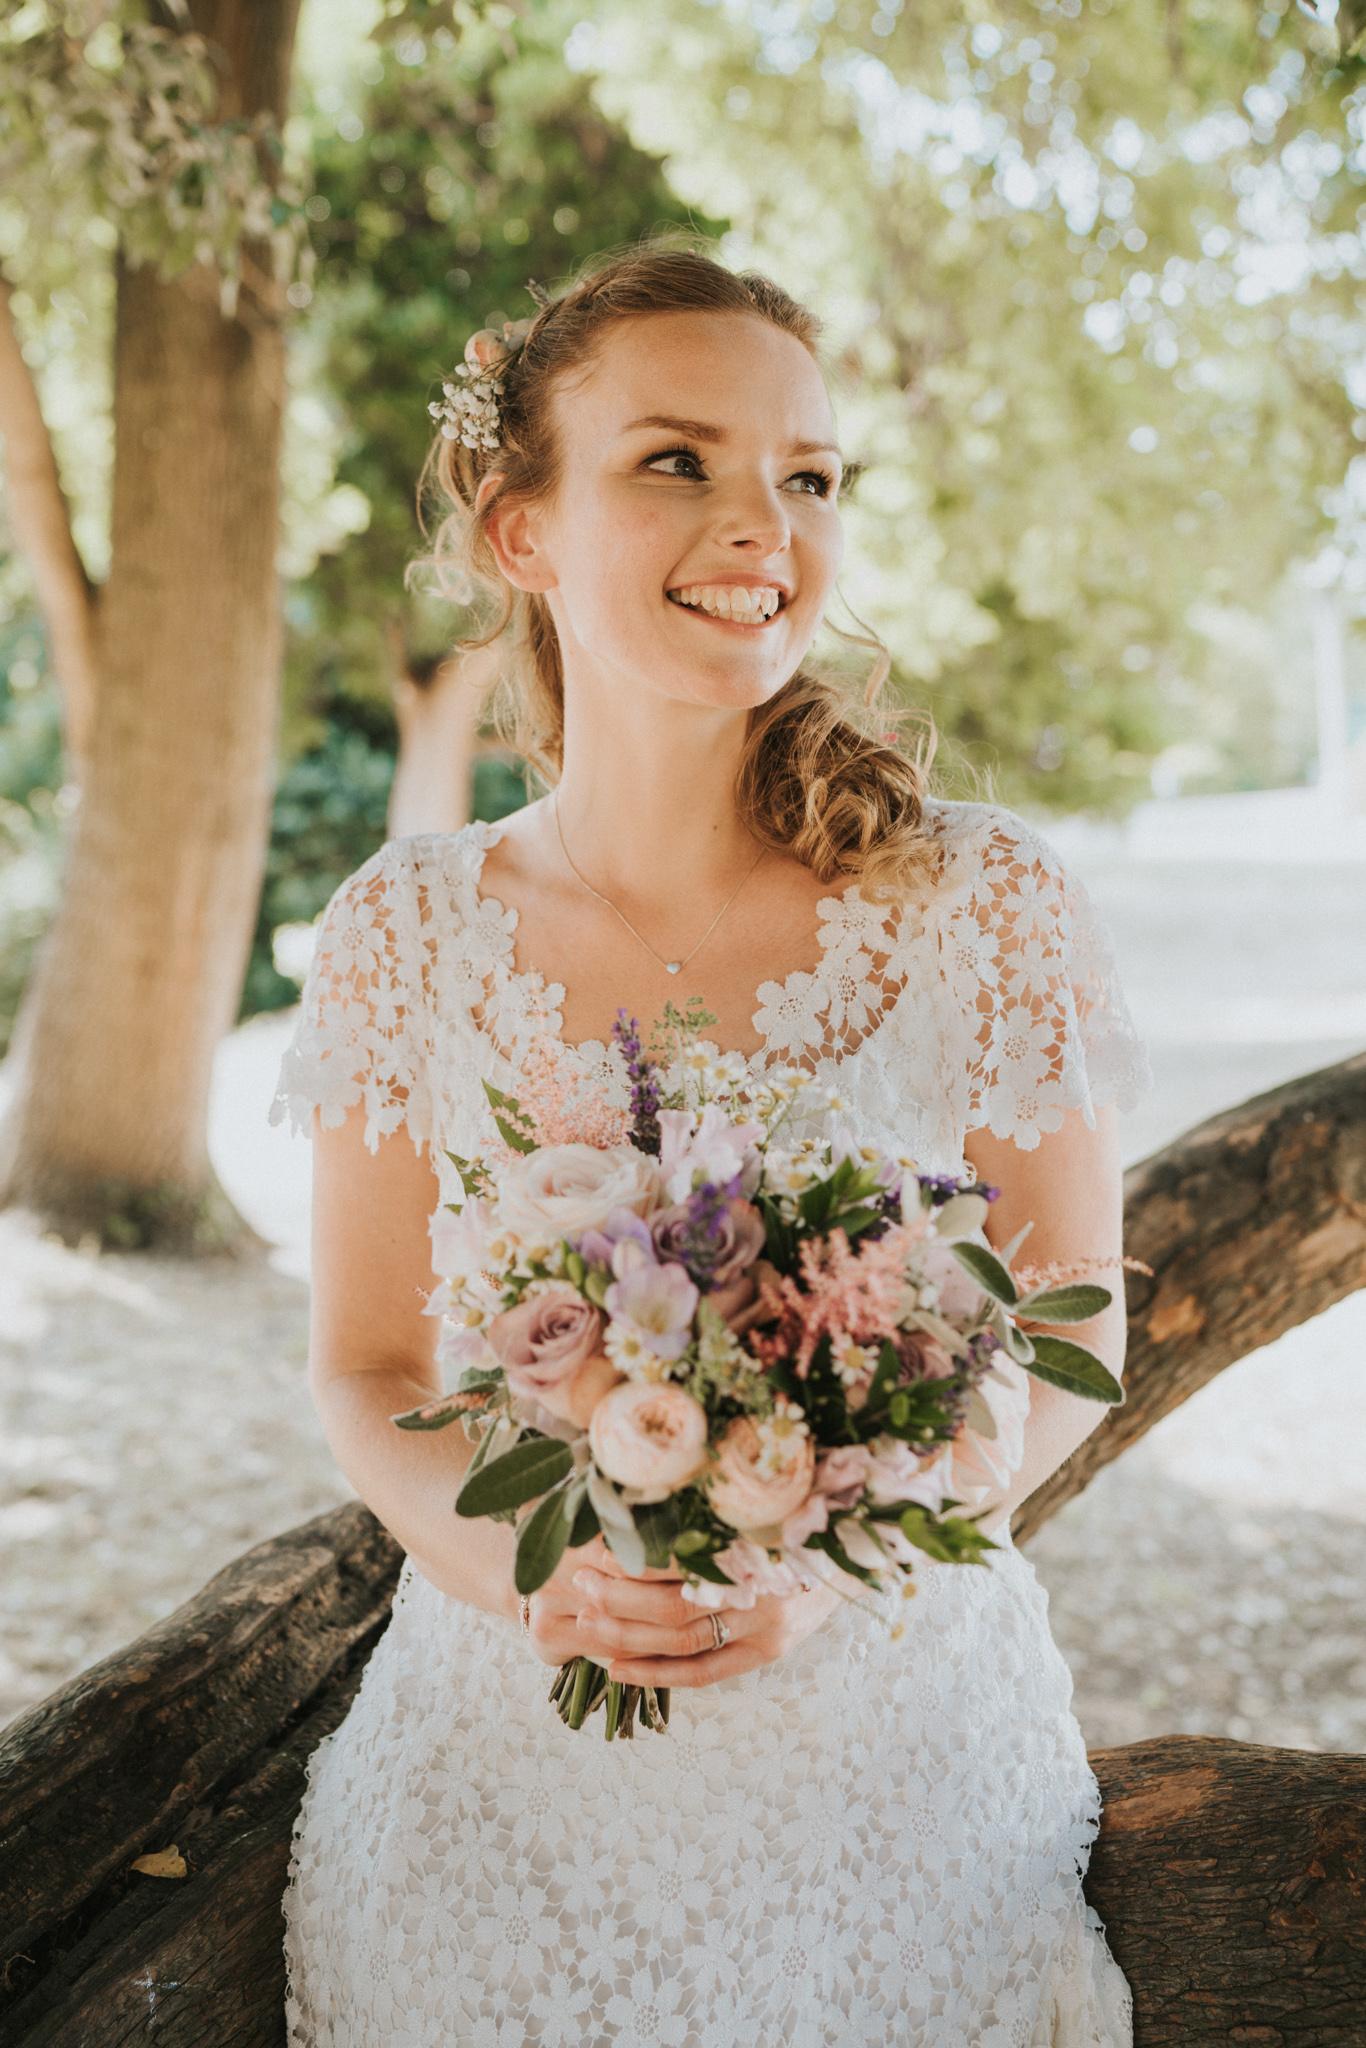 Grace-Elizabeth-Georgie-Amalaketu-Firstsite-Colchester-Essex-Boho-Buddhist-Wedding-Alternative-Wedding-Photography-Essex (88 of 100).jpg